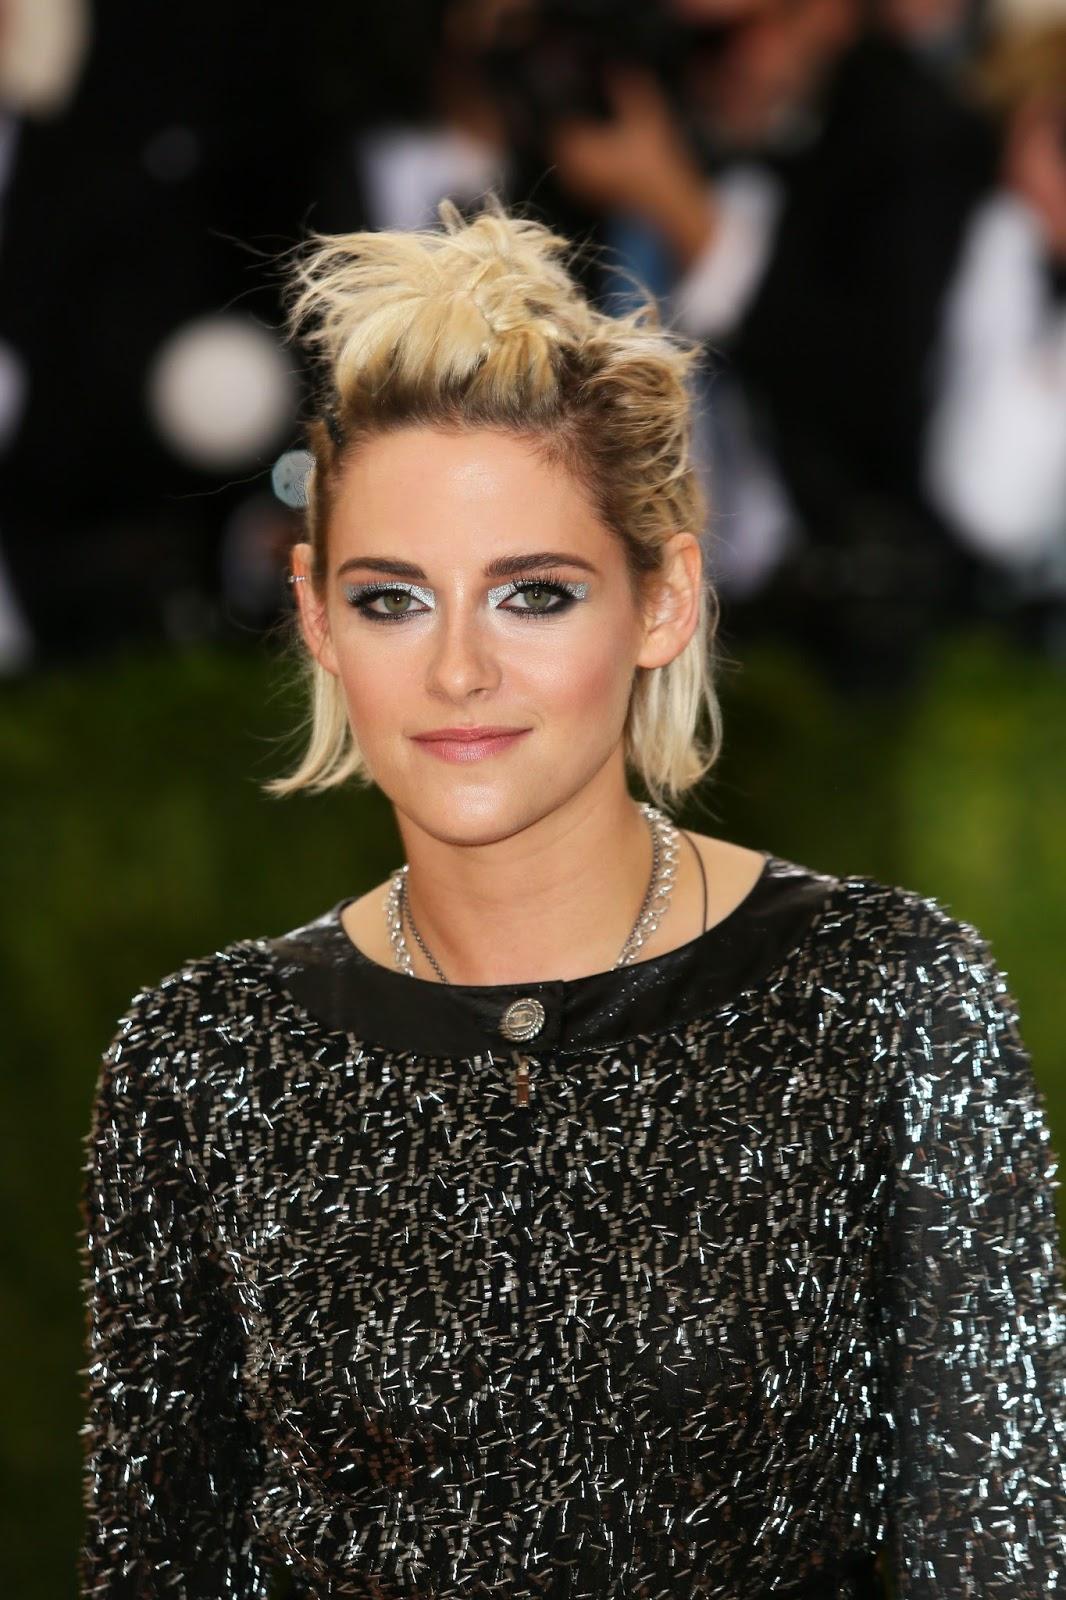 Team Kristen Site: Kristen will direct a short film for ...